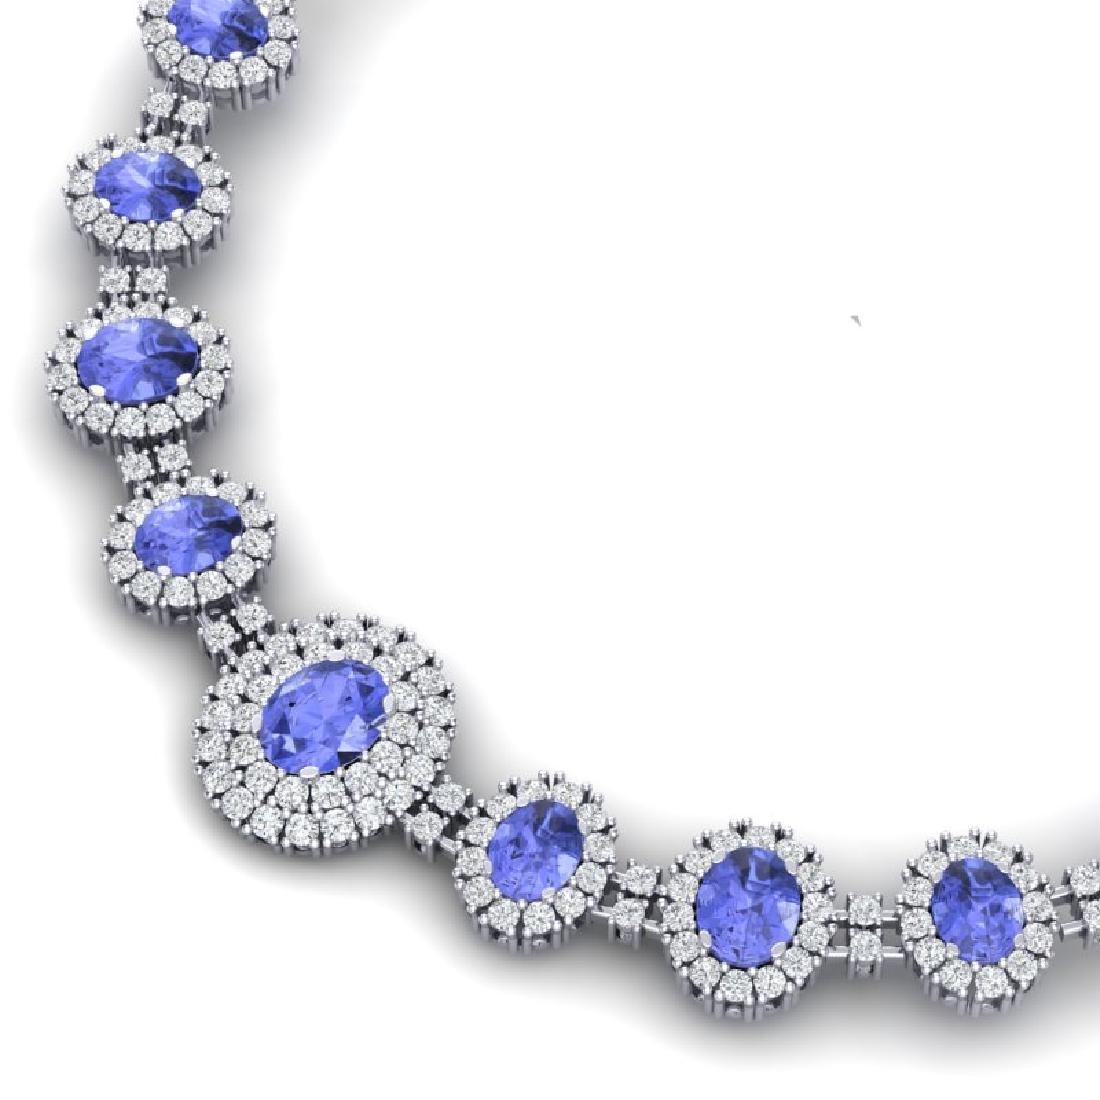 46.51 CTW Royalty Tanzanite & VS Diamond Necklace 18K - 2